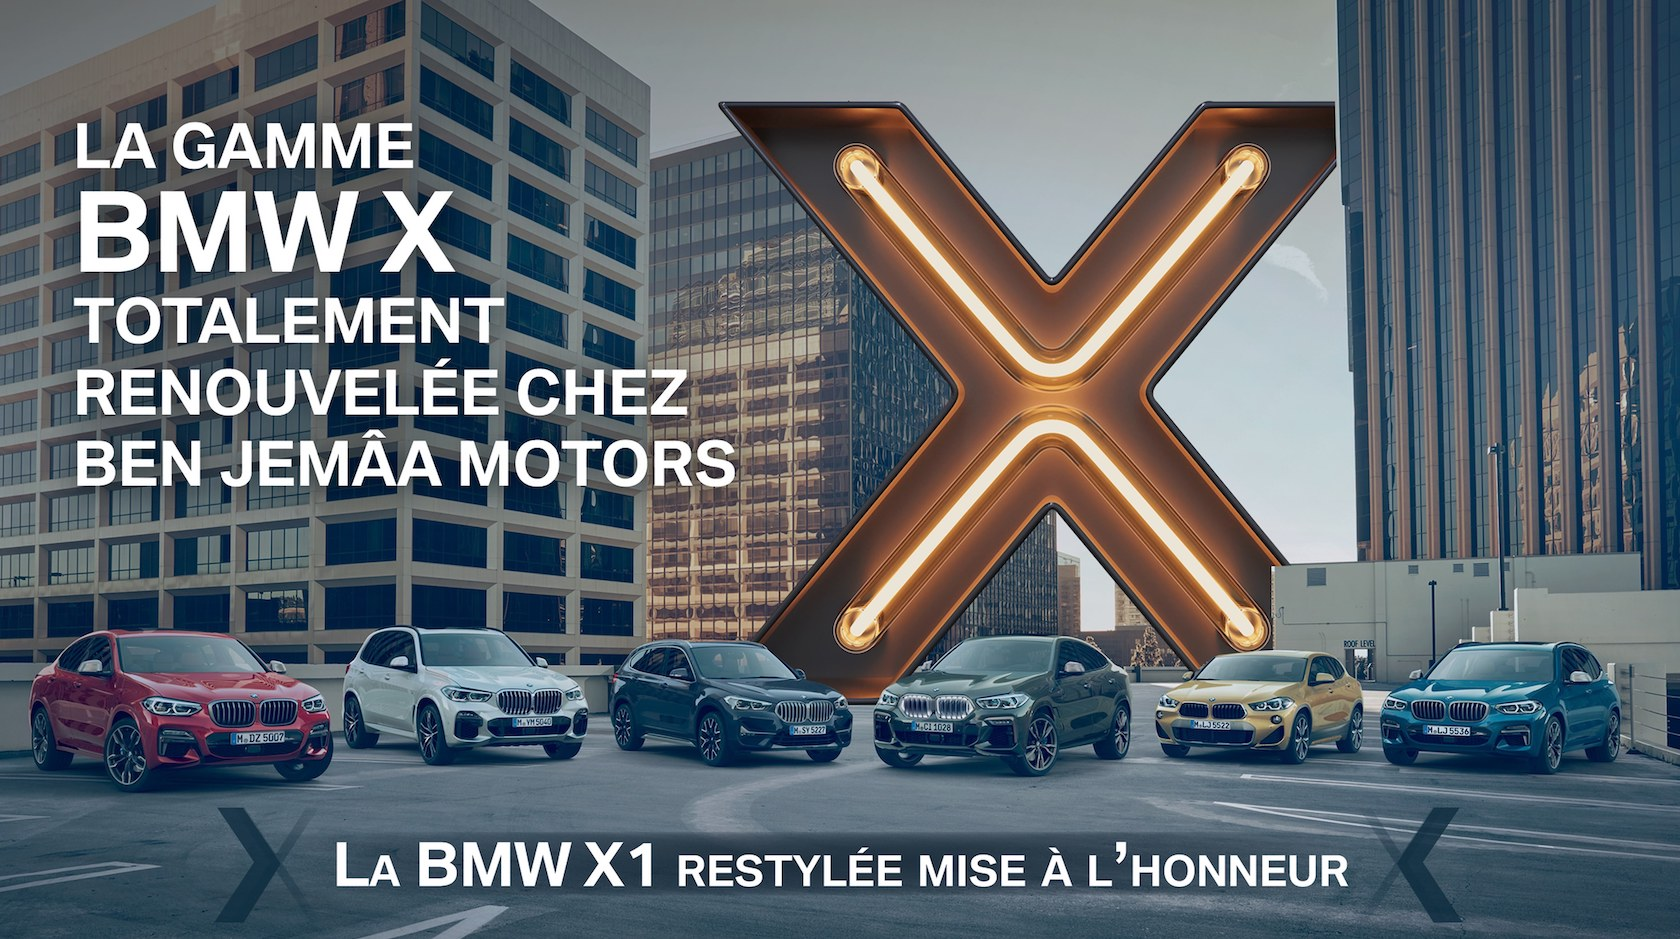 Gamme BMW X